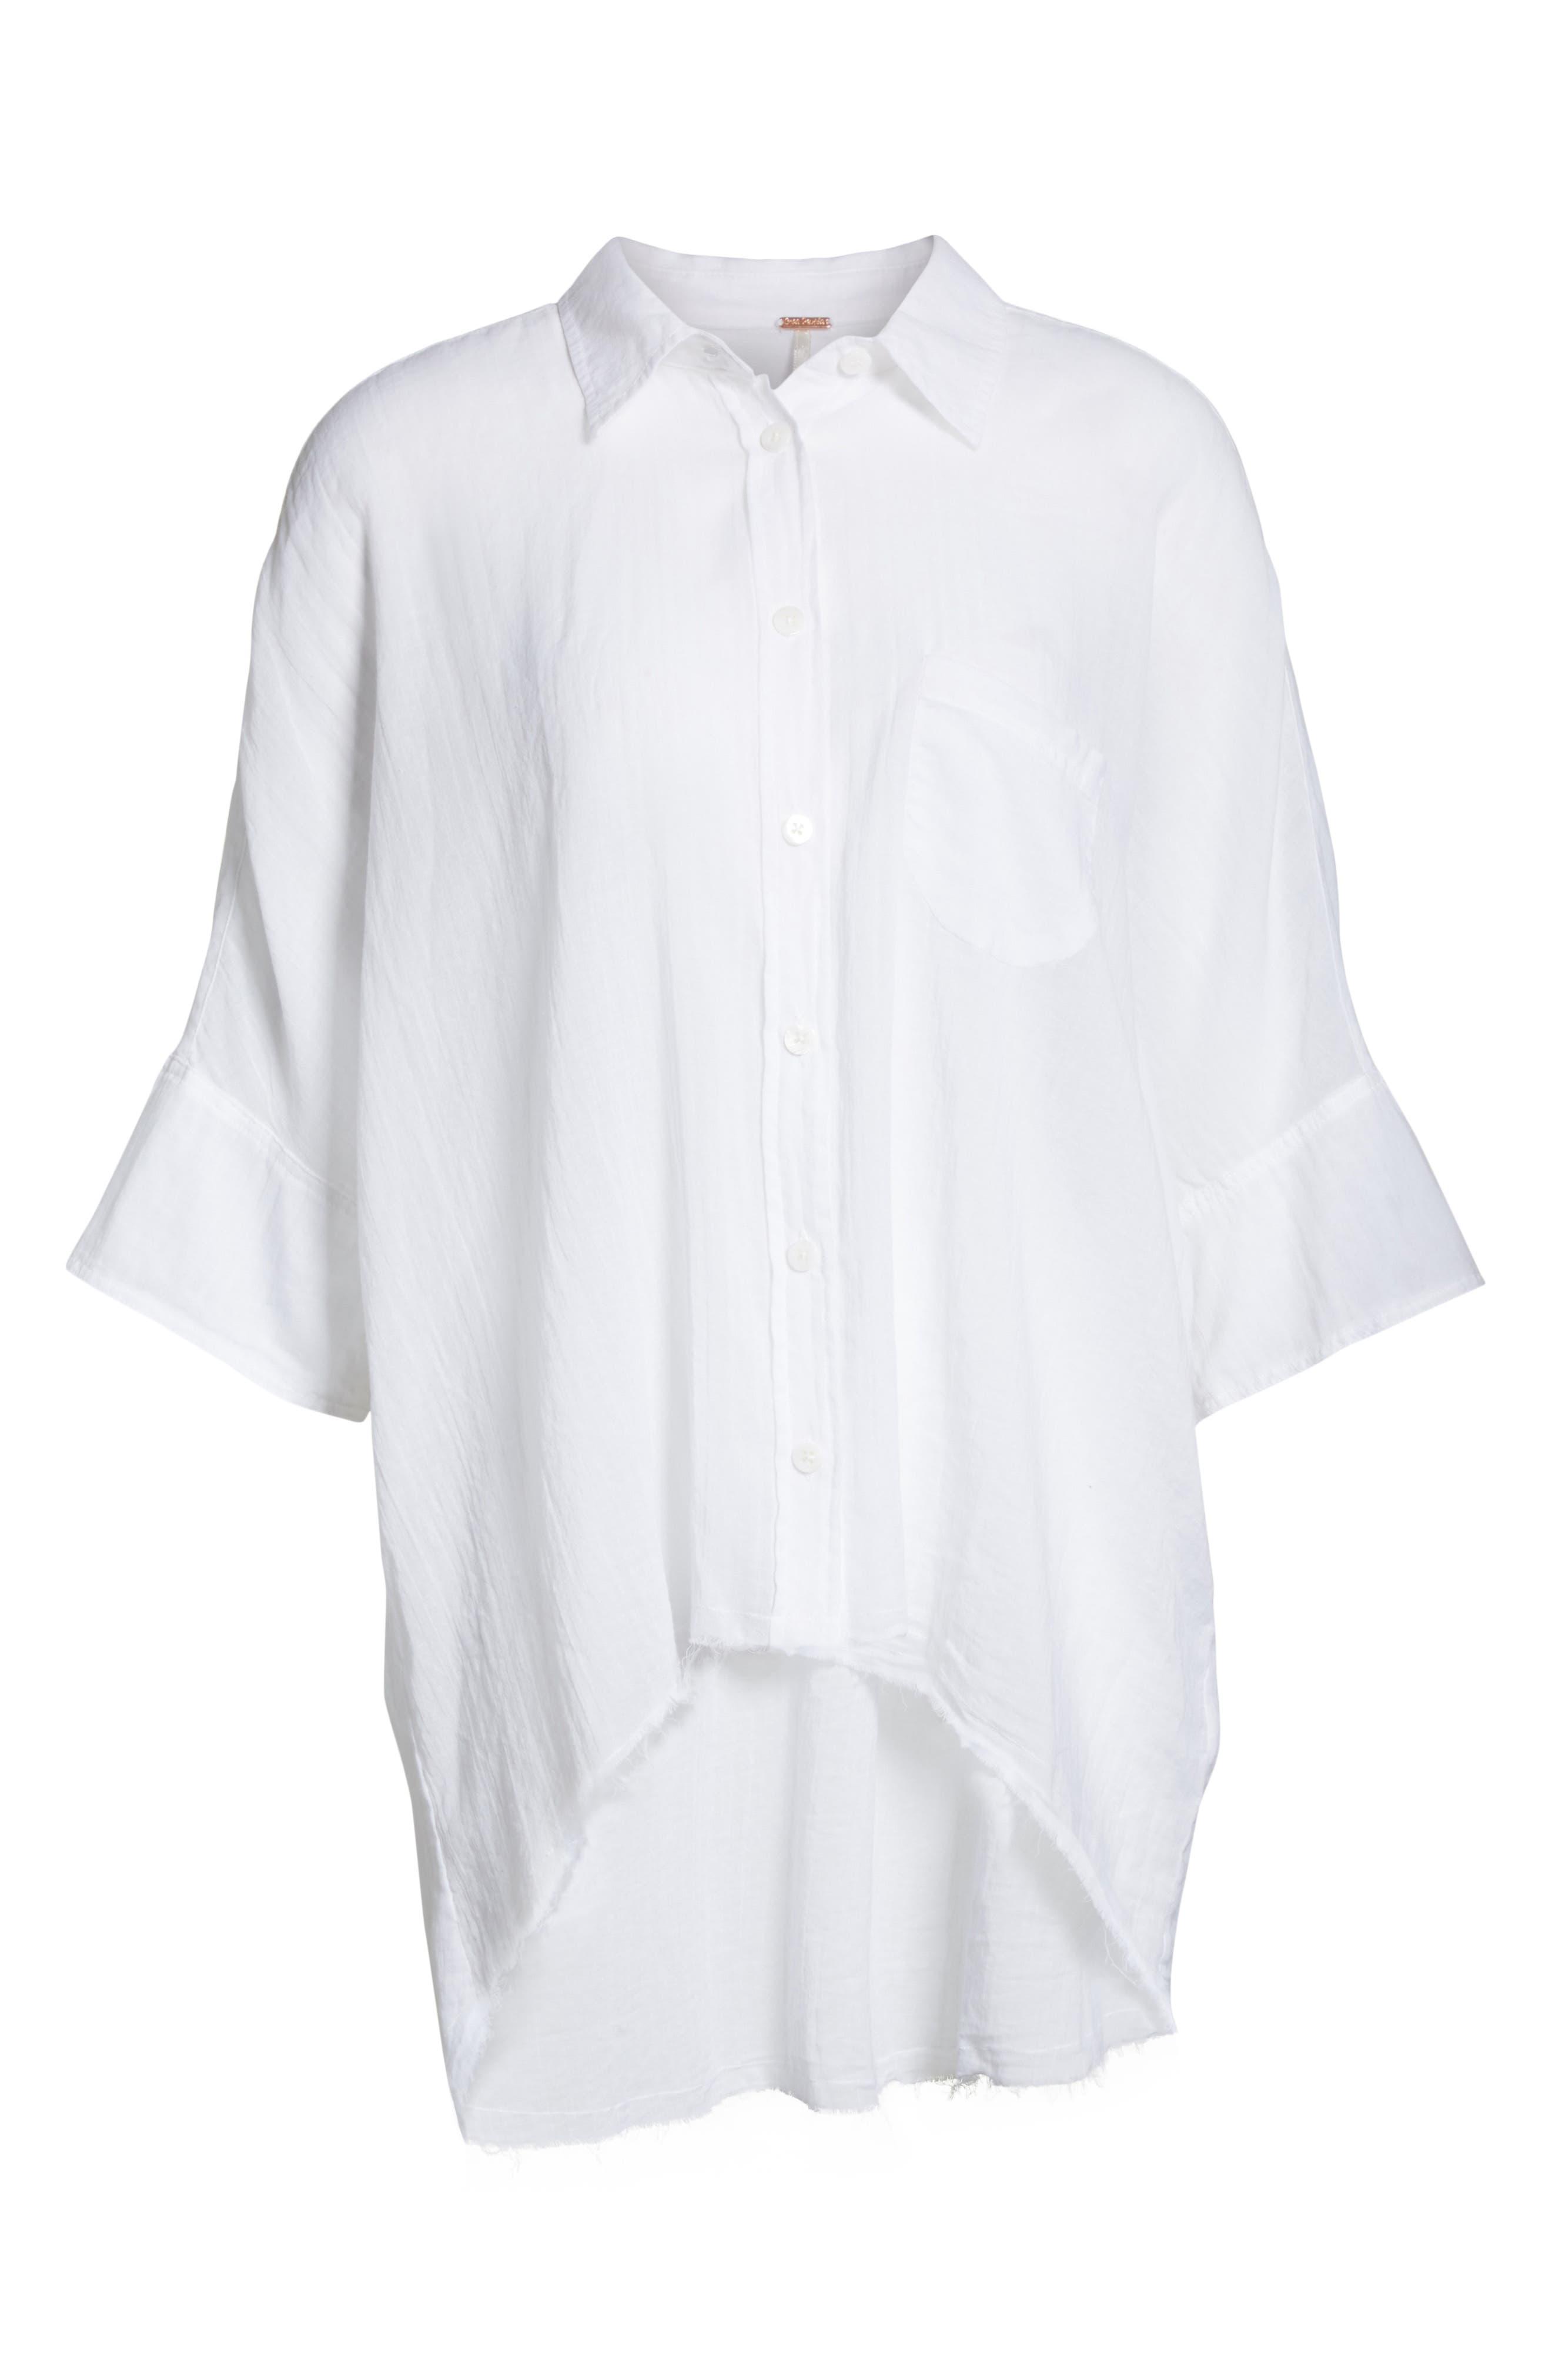 Best of Me Button Down Shirt,                             Alternate thumbnail 22, color,